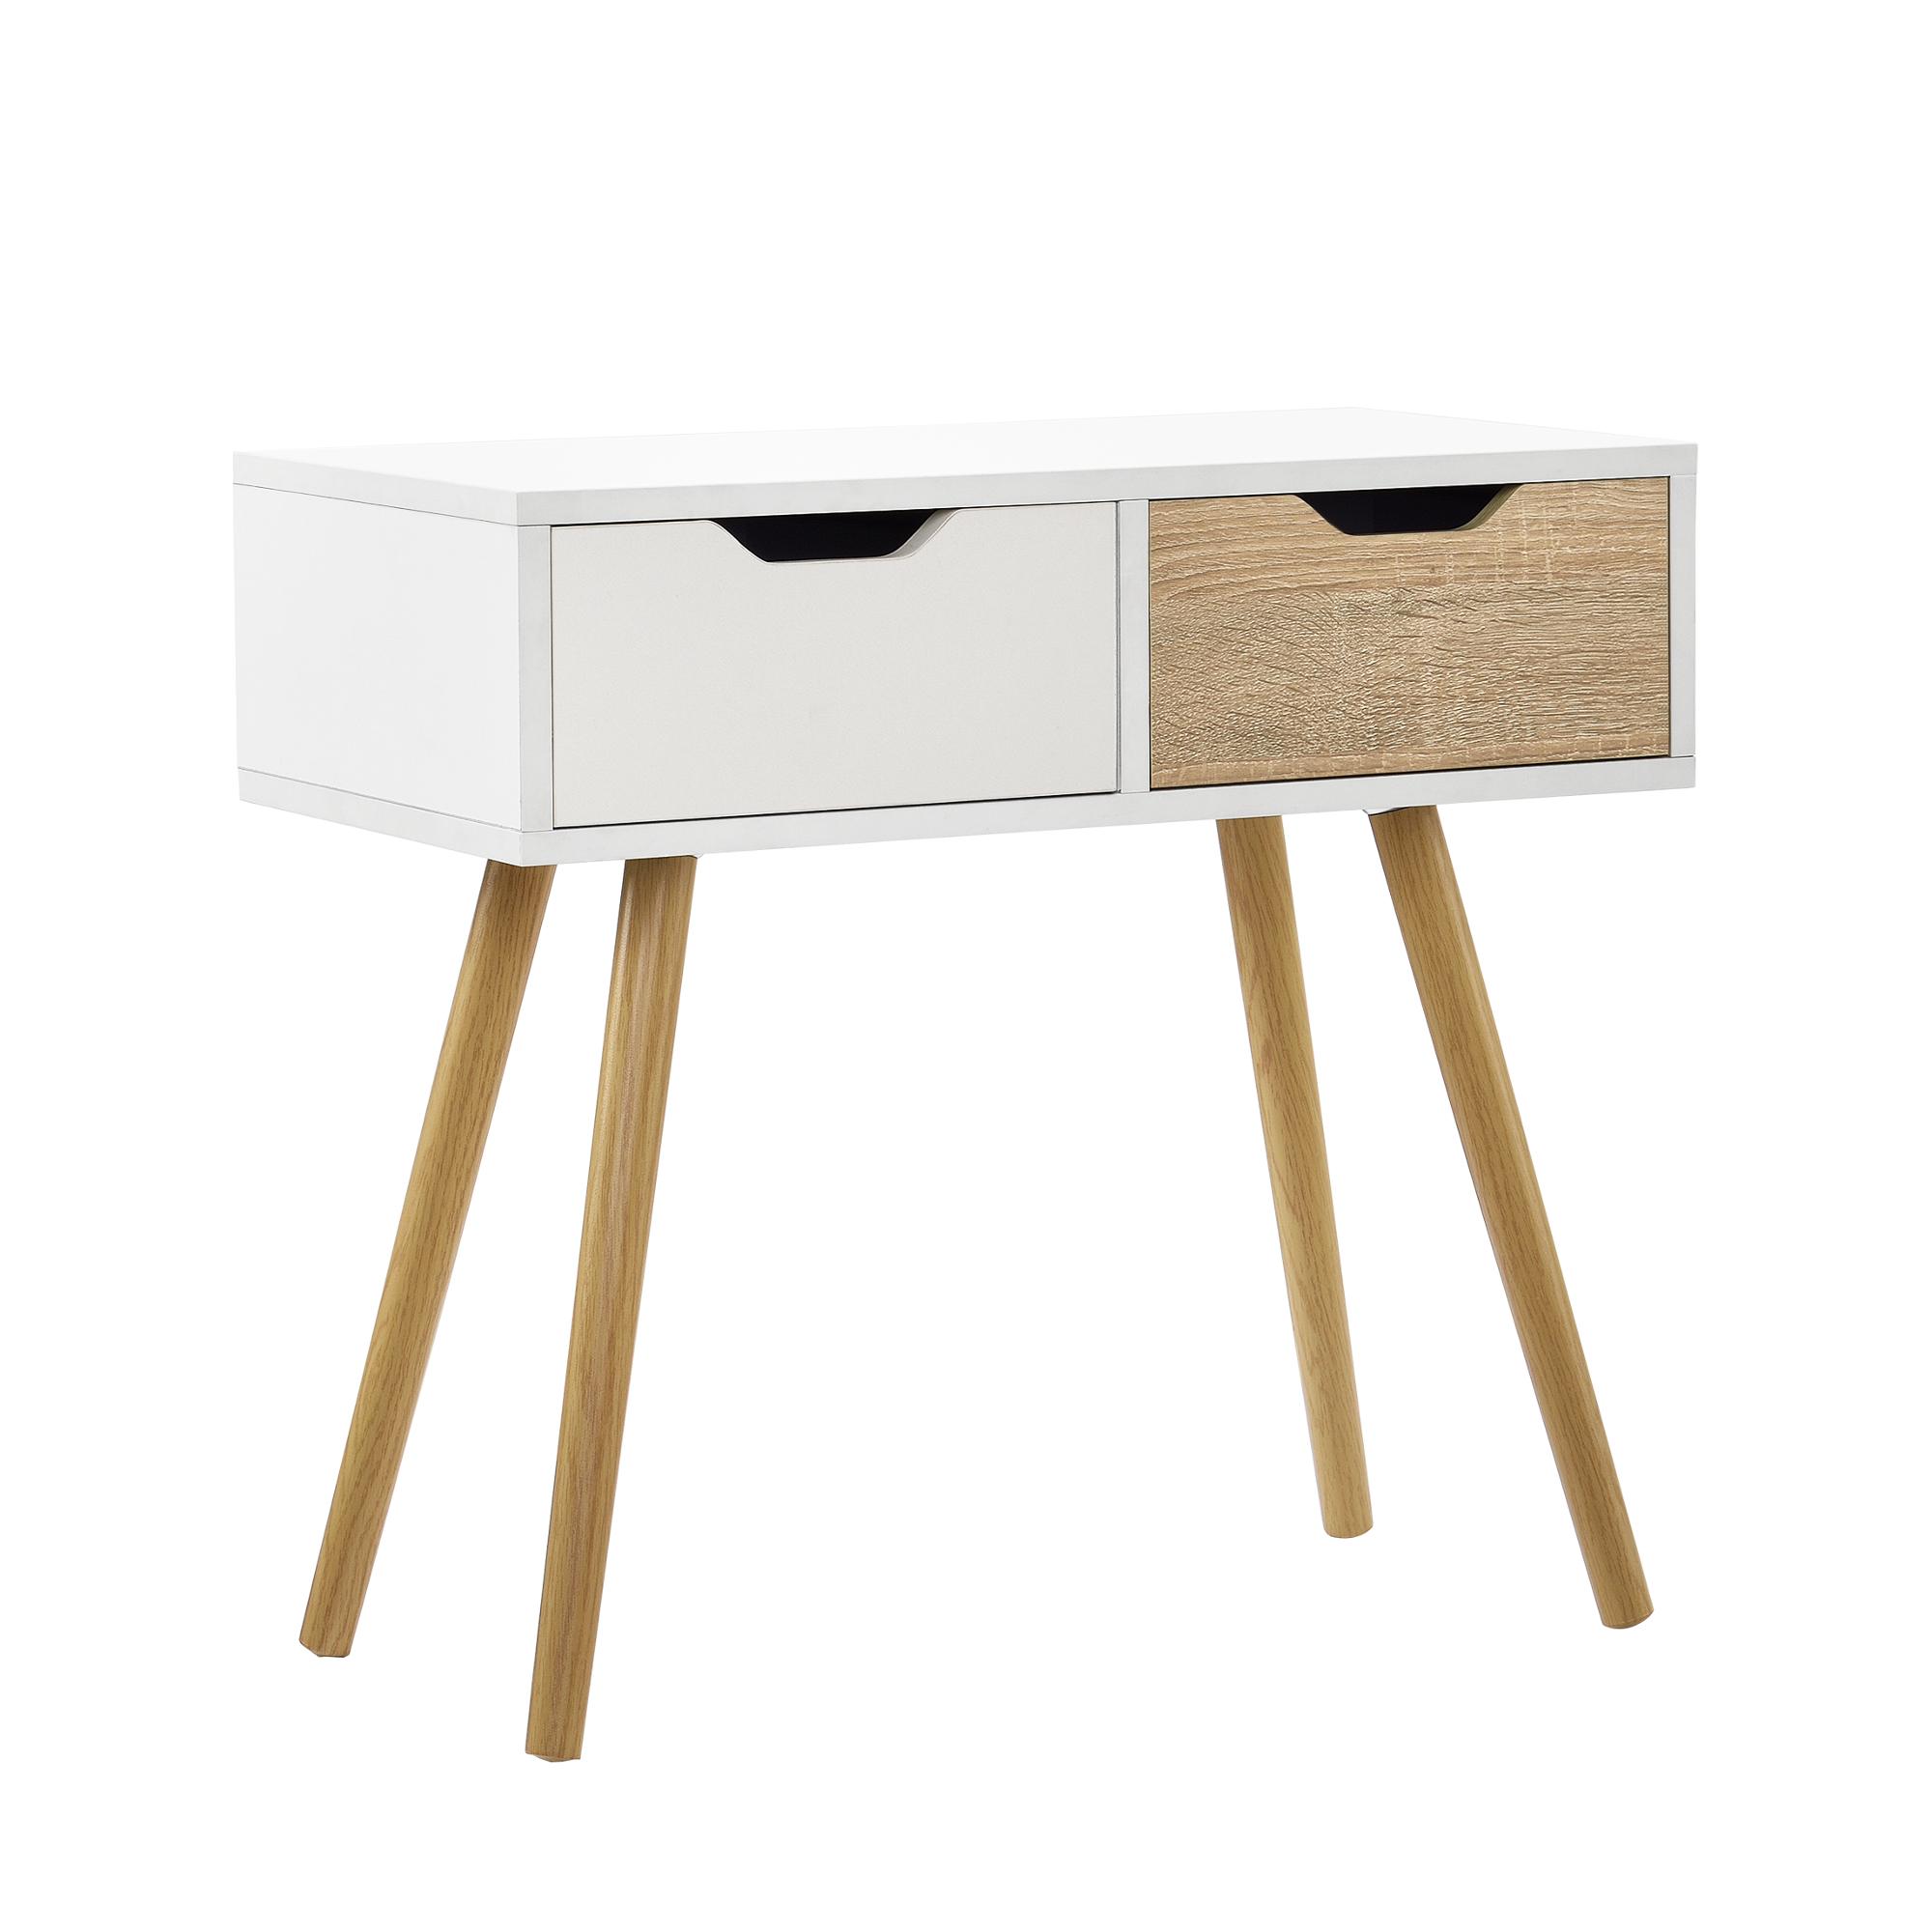 design kommode sideboard schrank beistelltisch. Black Bedroom Furniture Sets. Home Design Ideas